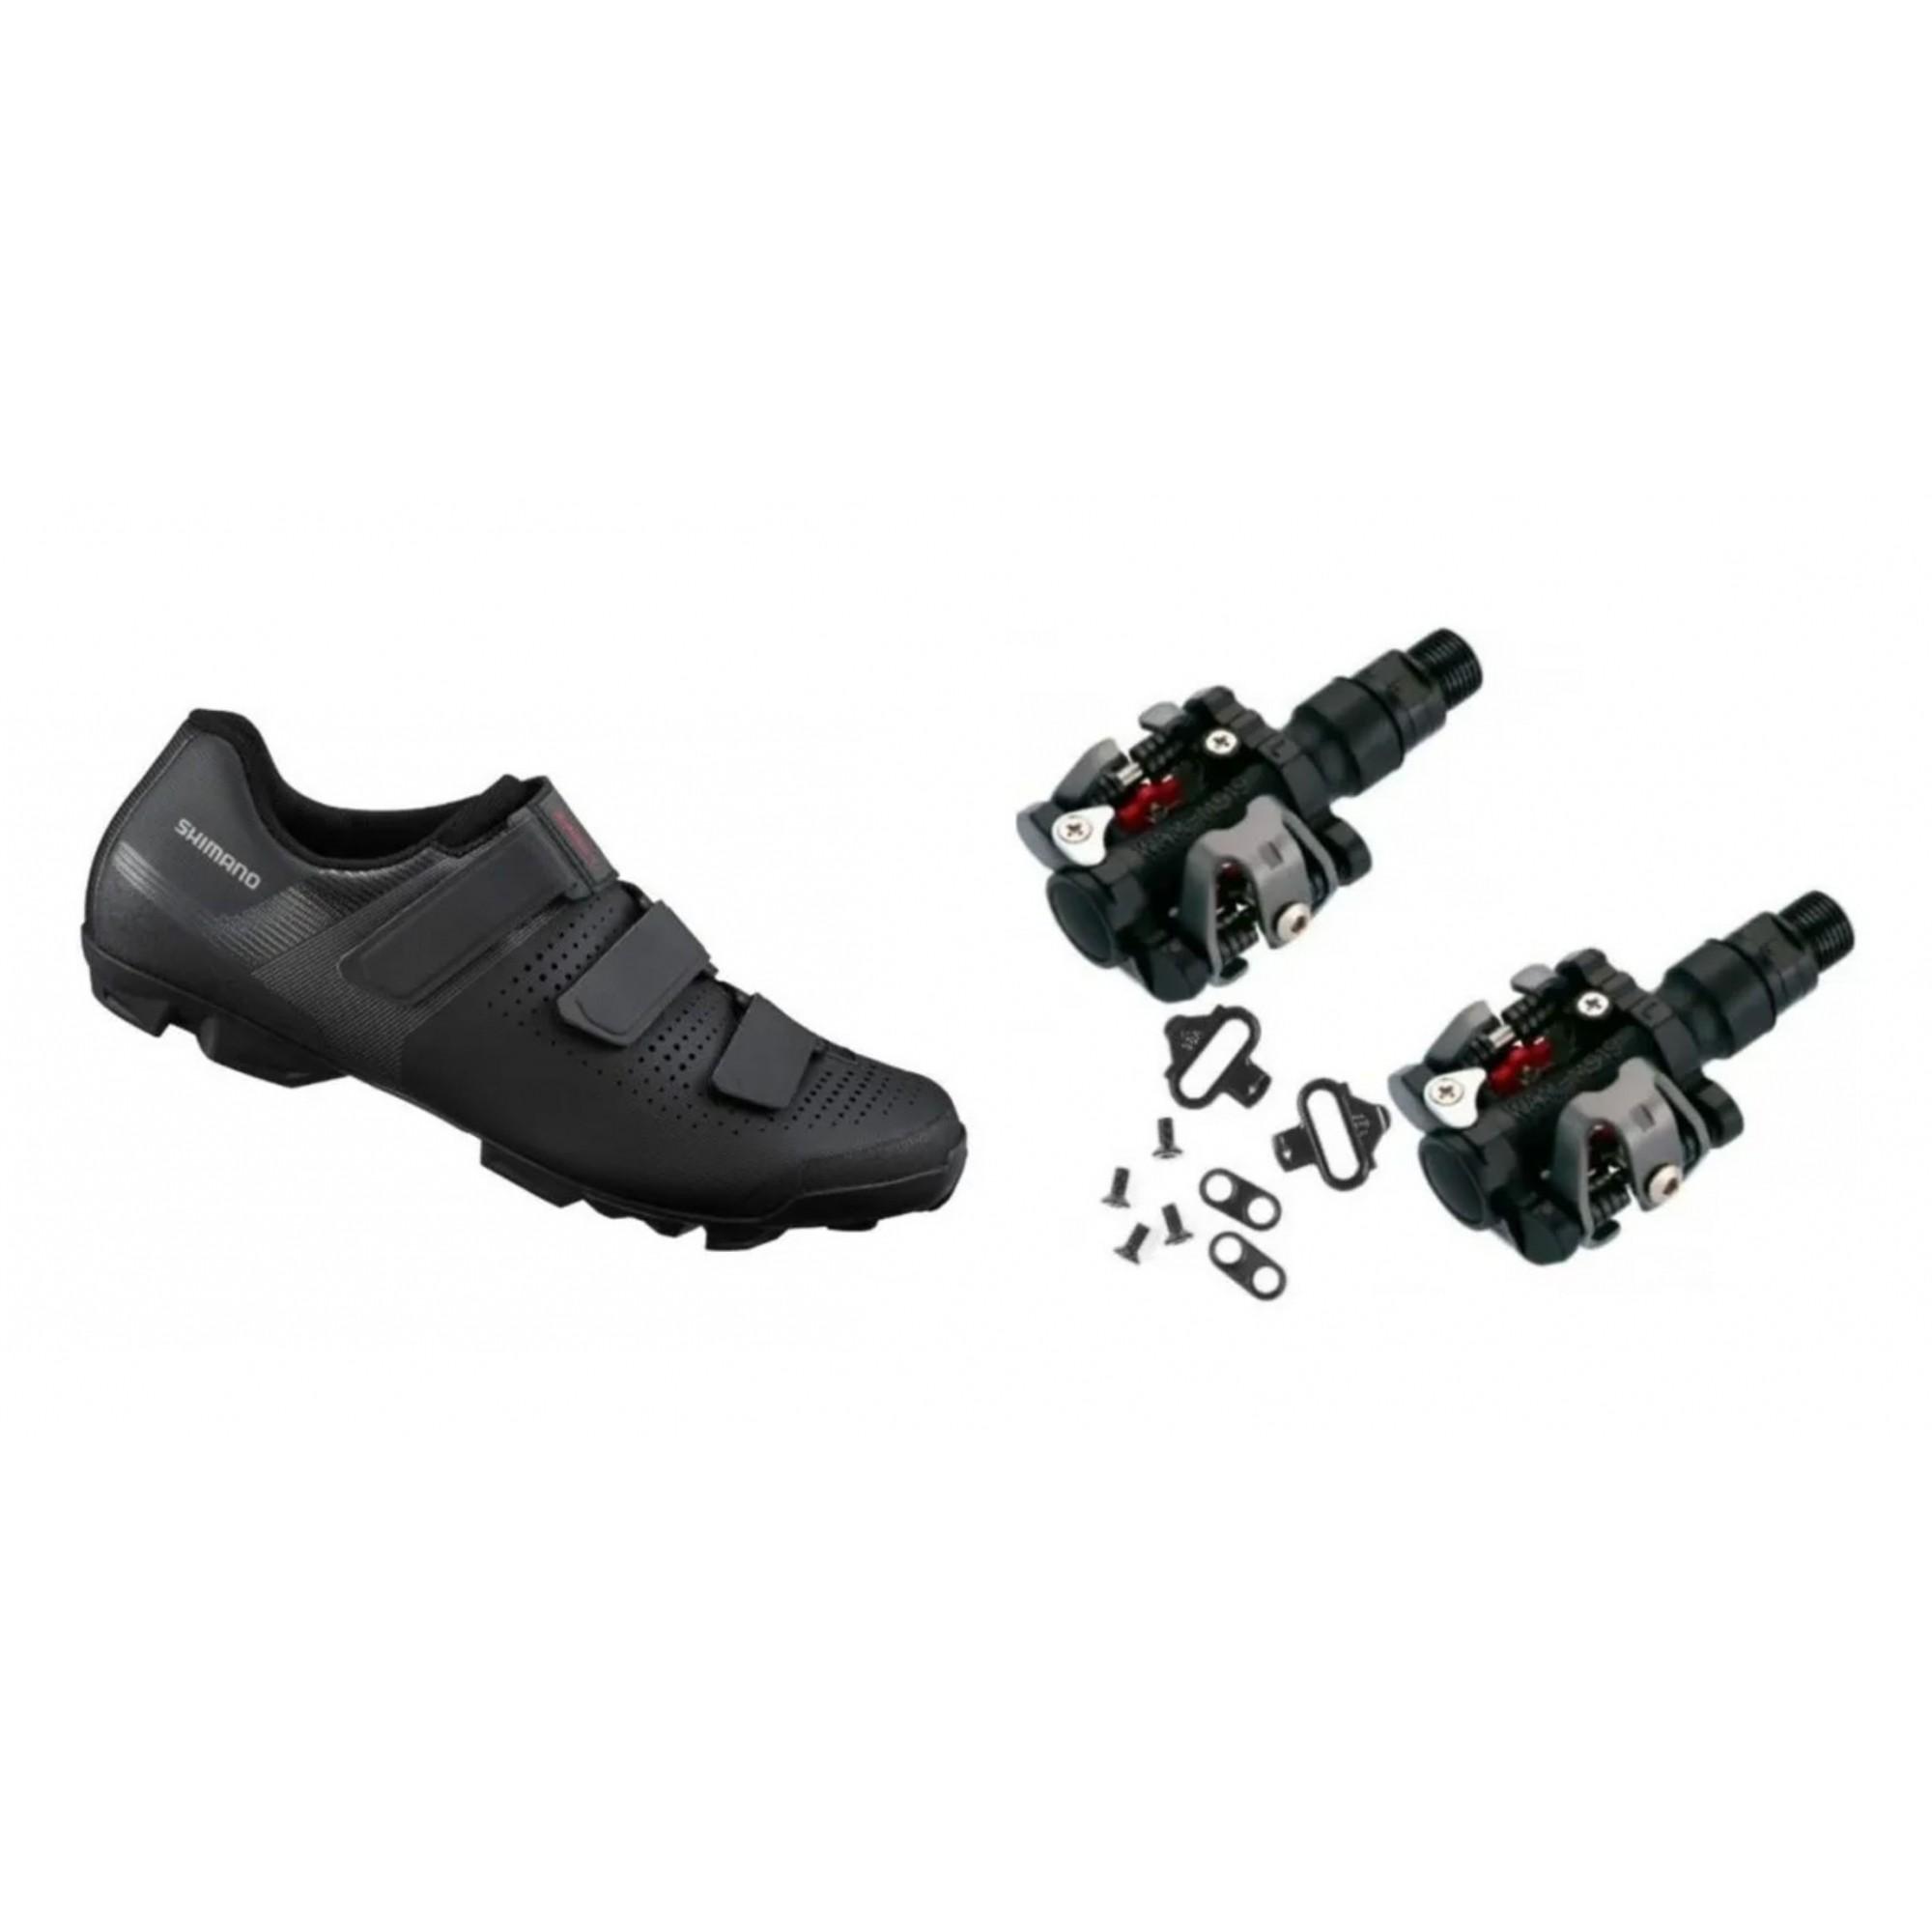 Sapatilha Shimano Xc1 Xc100 + Pedal Clip Wellgo + Tacos Mtb